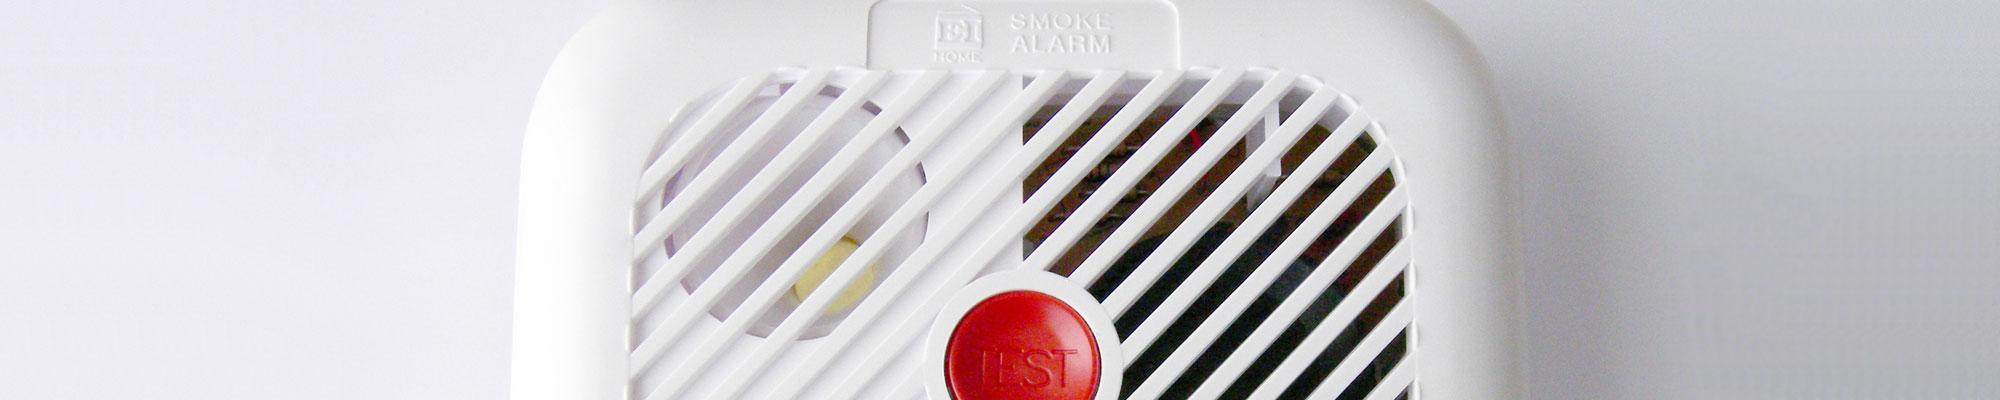 Smoke alarm, Smoke Detecors and fire alarms. Daton Electrical provide smoke alarm installation around Reading